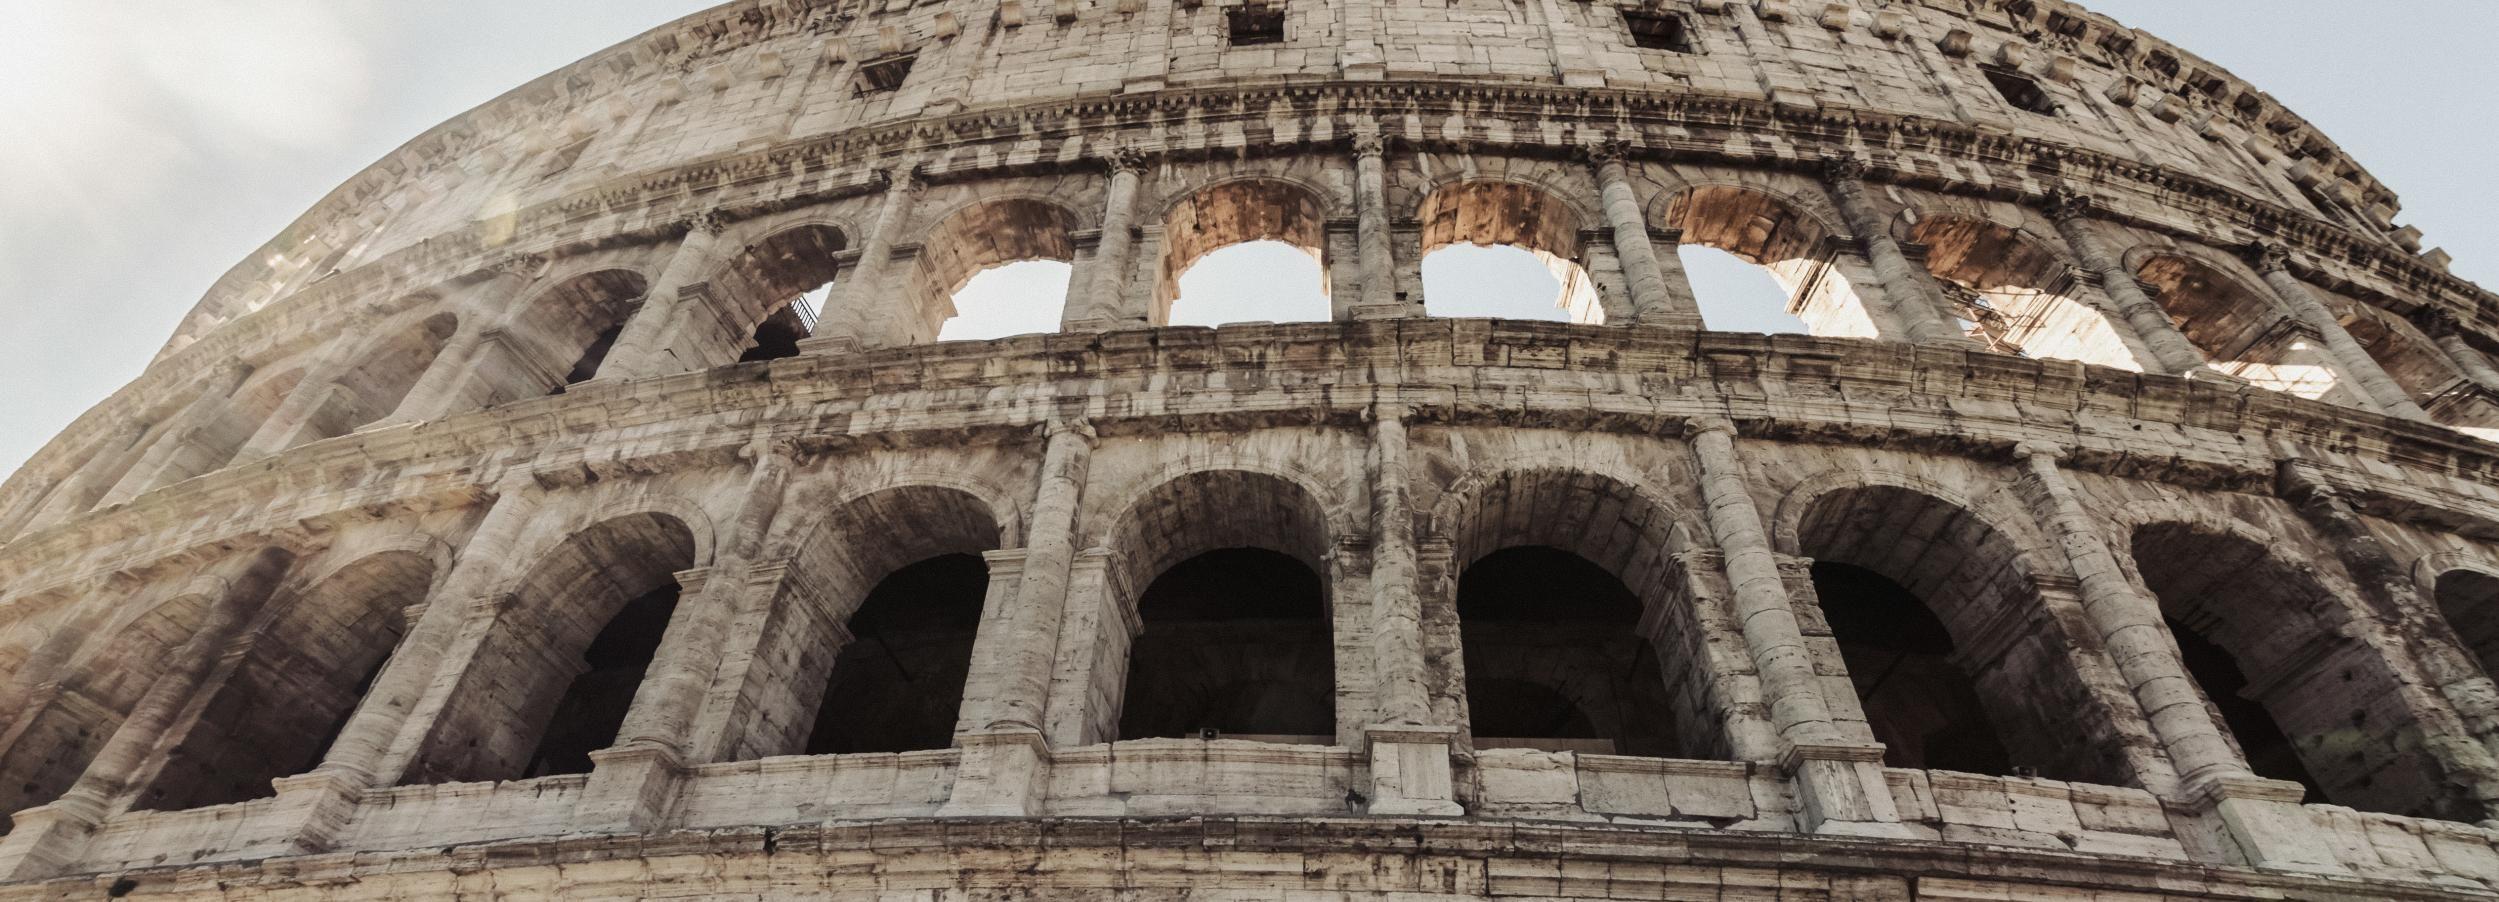 Roma: tour virtuale Colosseo e gladiatori